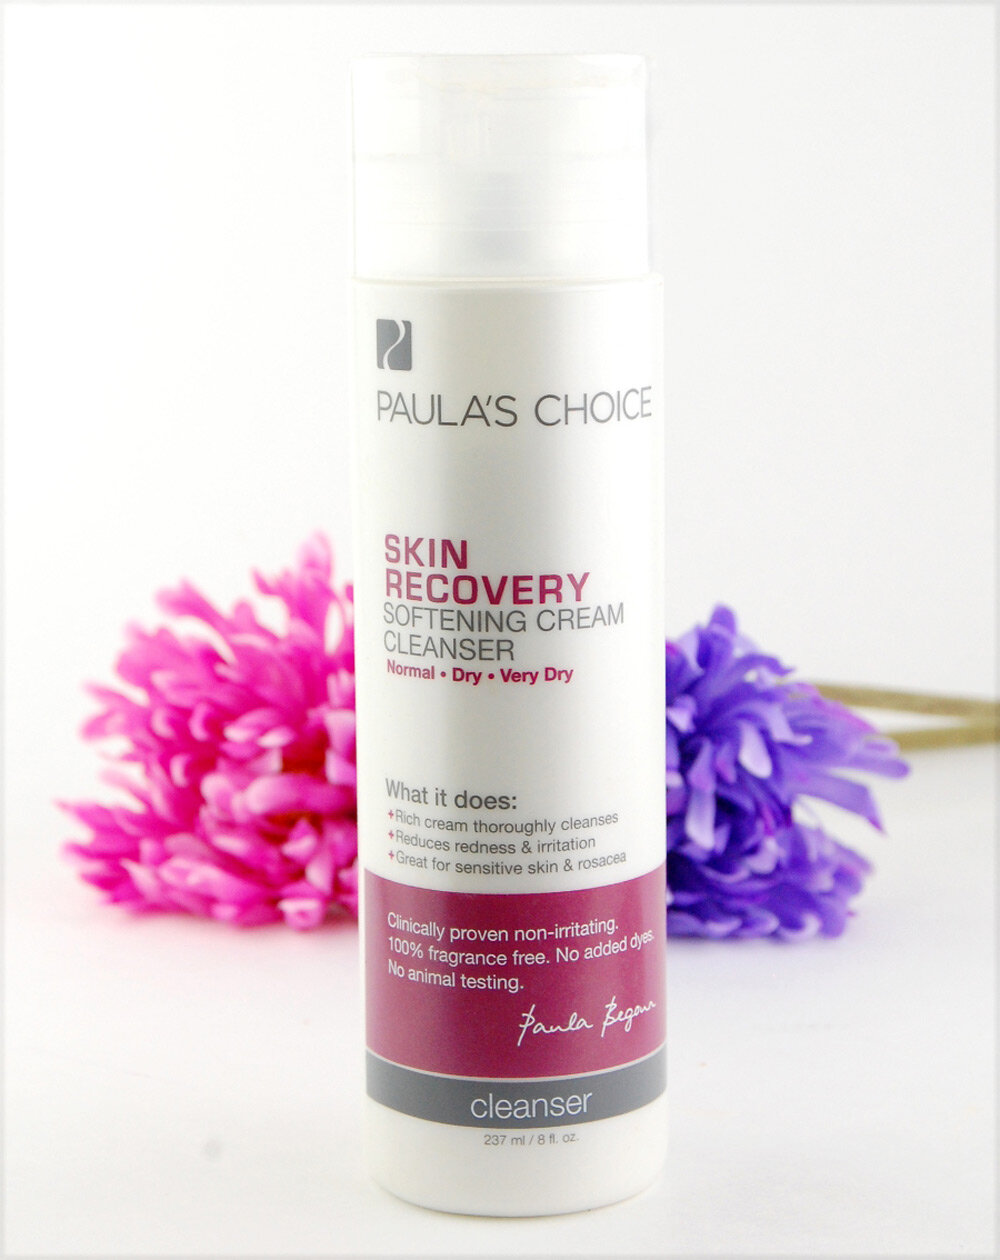 Review sữa rửa mặt cho da khô Paula's Choice Skin Recovery Softening Cream